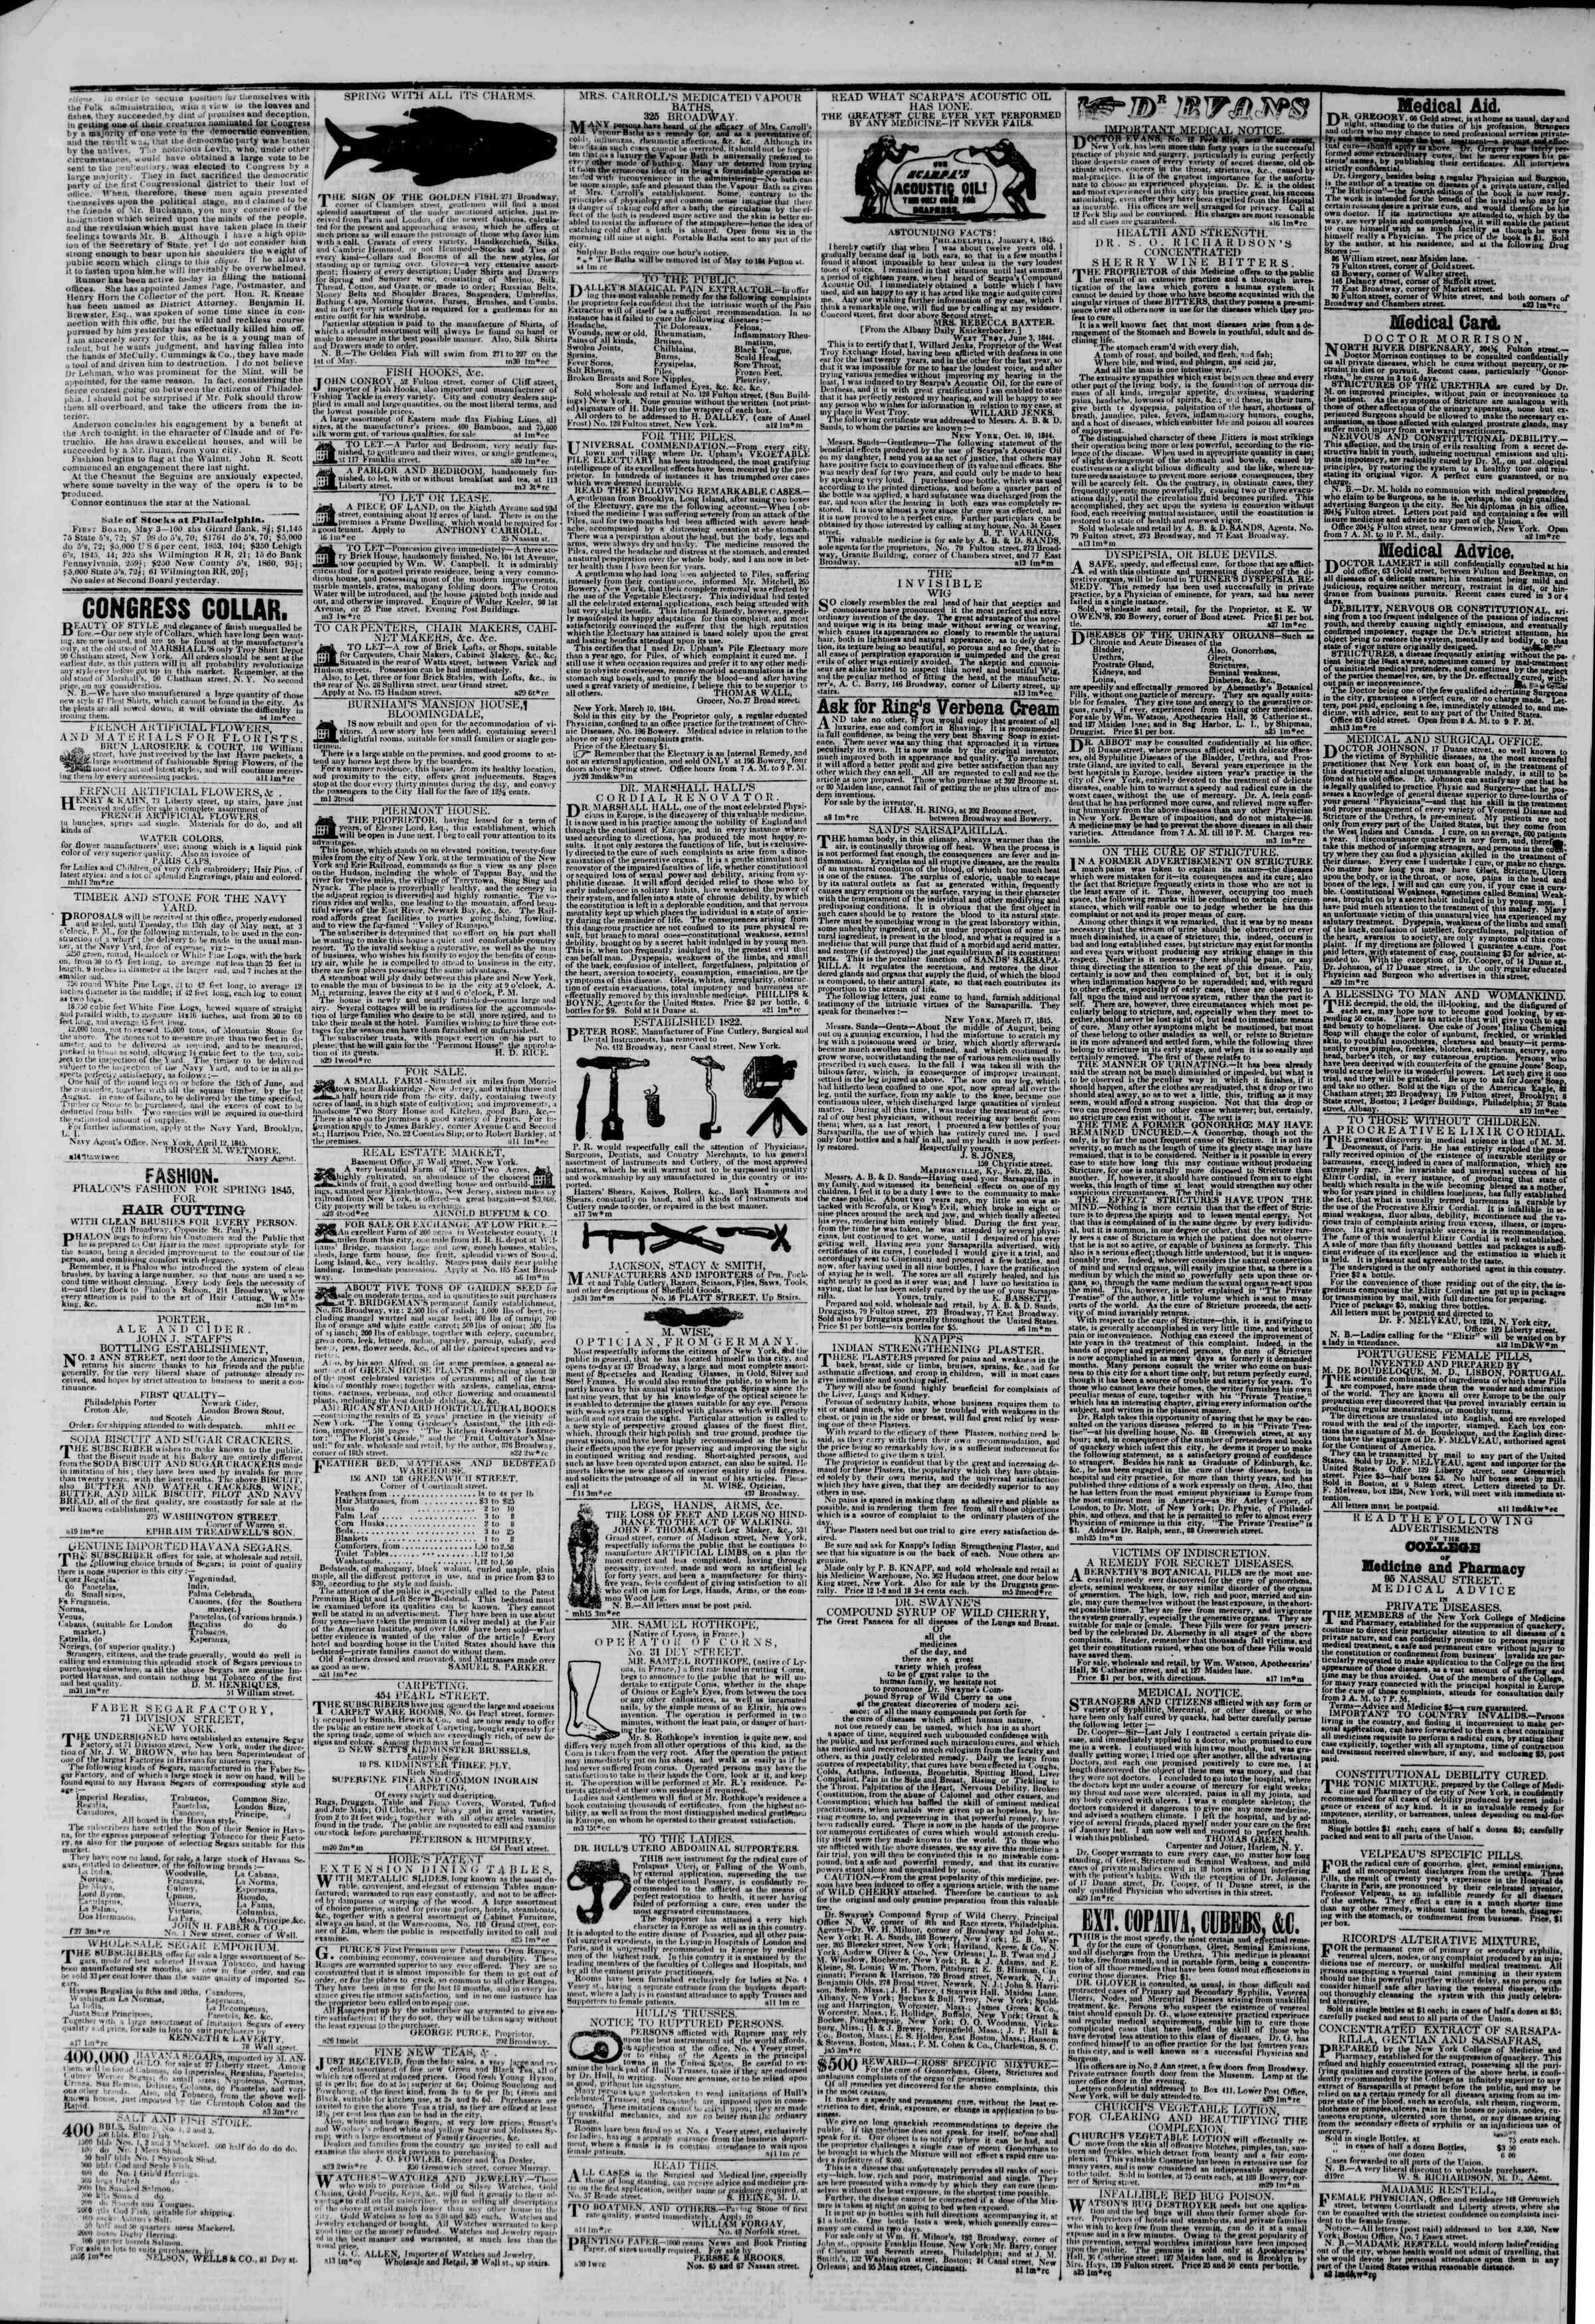 May 4, 1845 Tarihli The New York Herald Gazetesi Sayfa 4